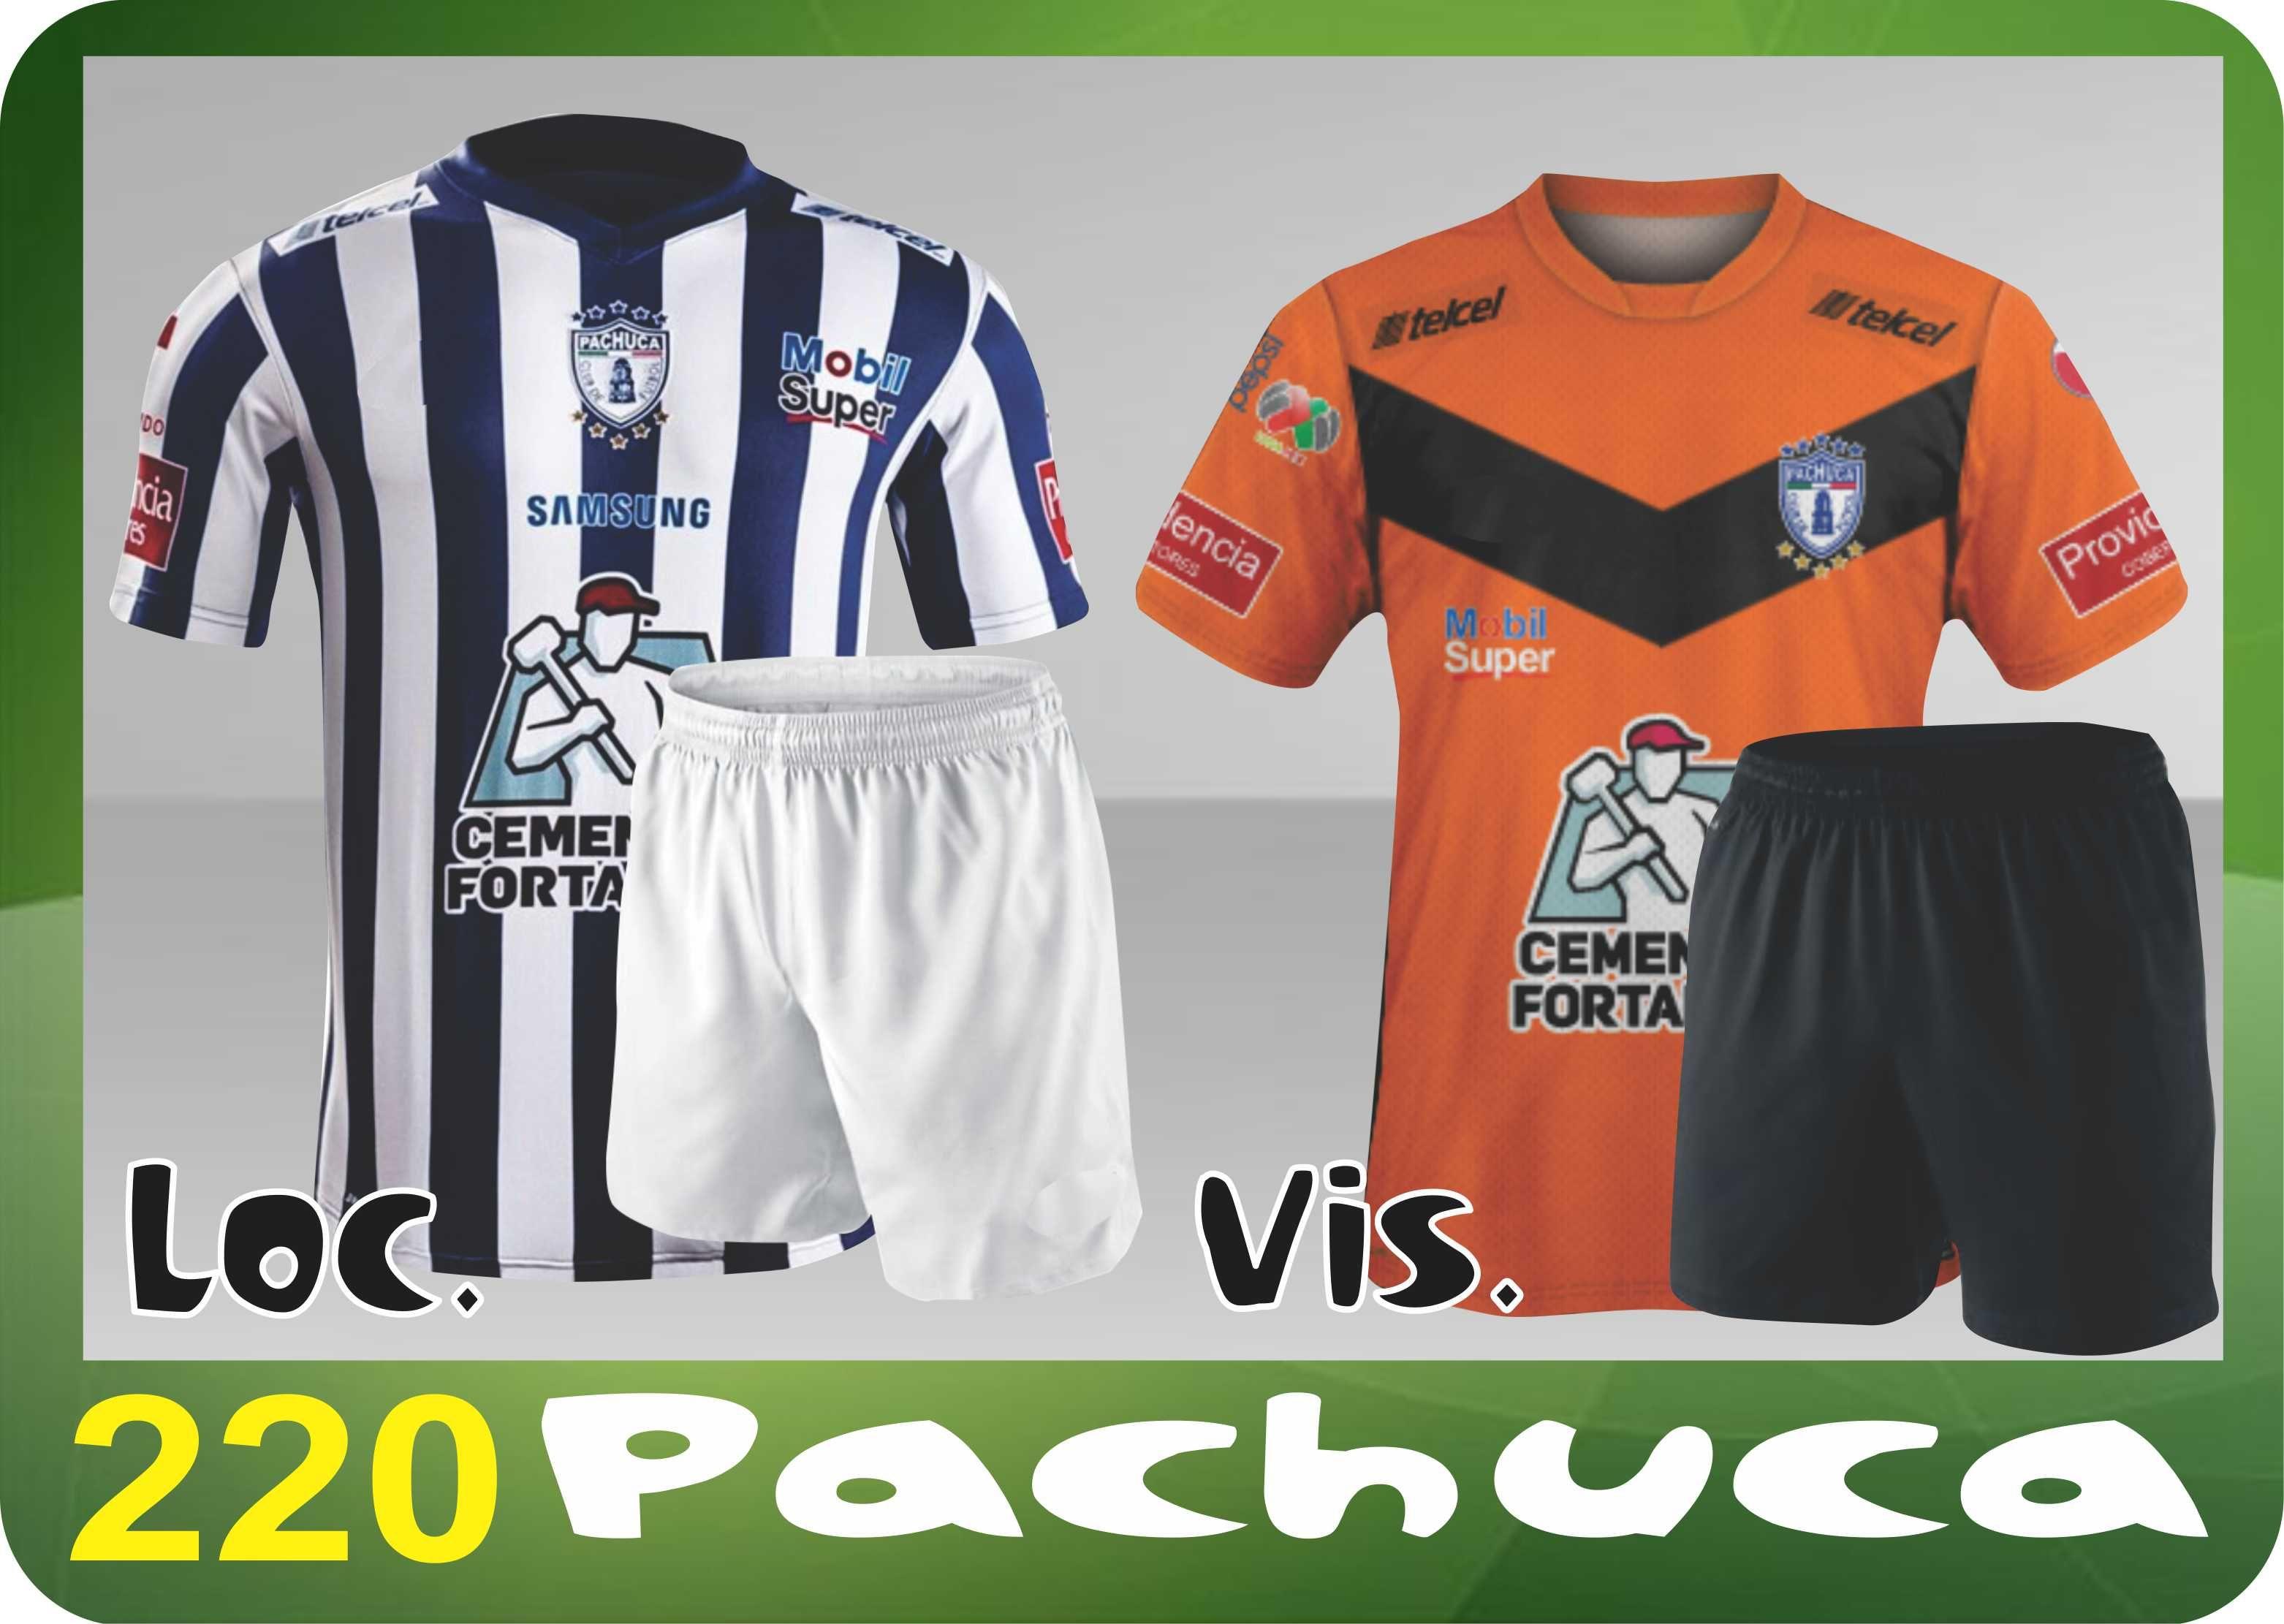 UNIFORME SOCCER DRI FIT. Mod. 220 PACHUCA Uniformes De Futbol d7299c5cb4c